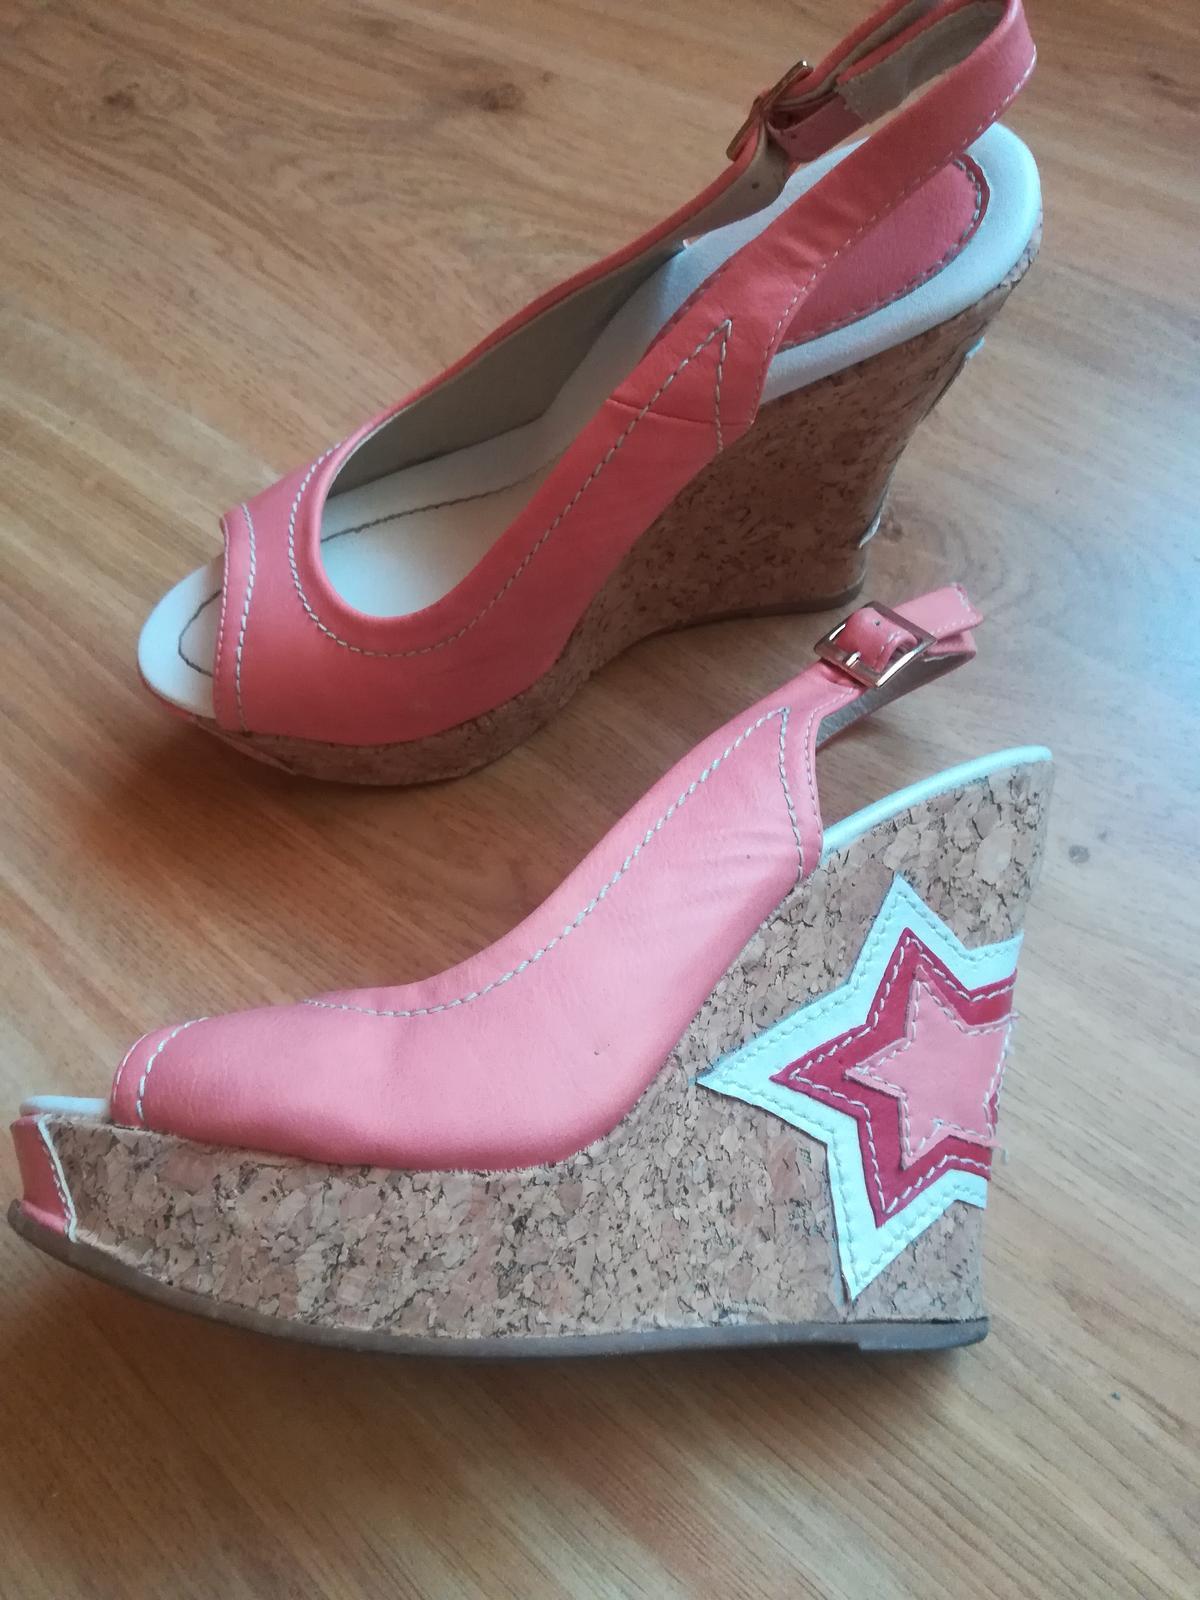 Lososové sandále na platforme - Obrázok č. 1